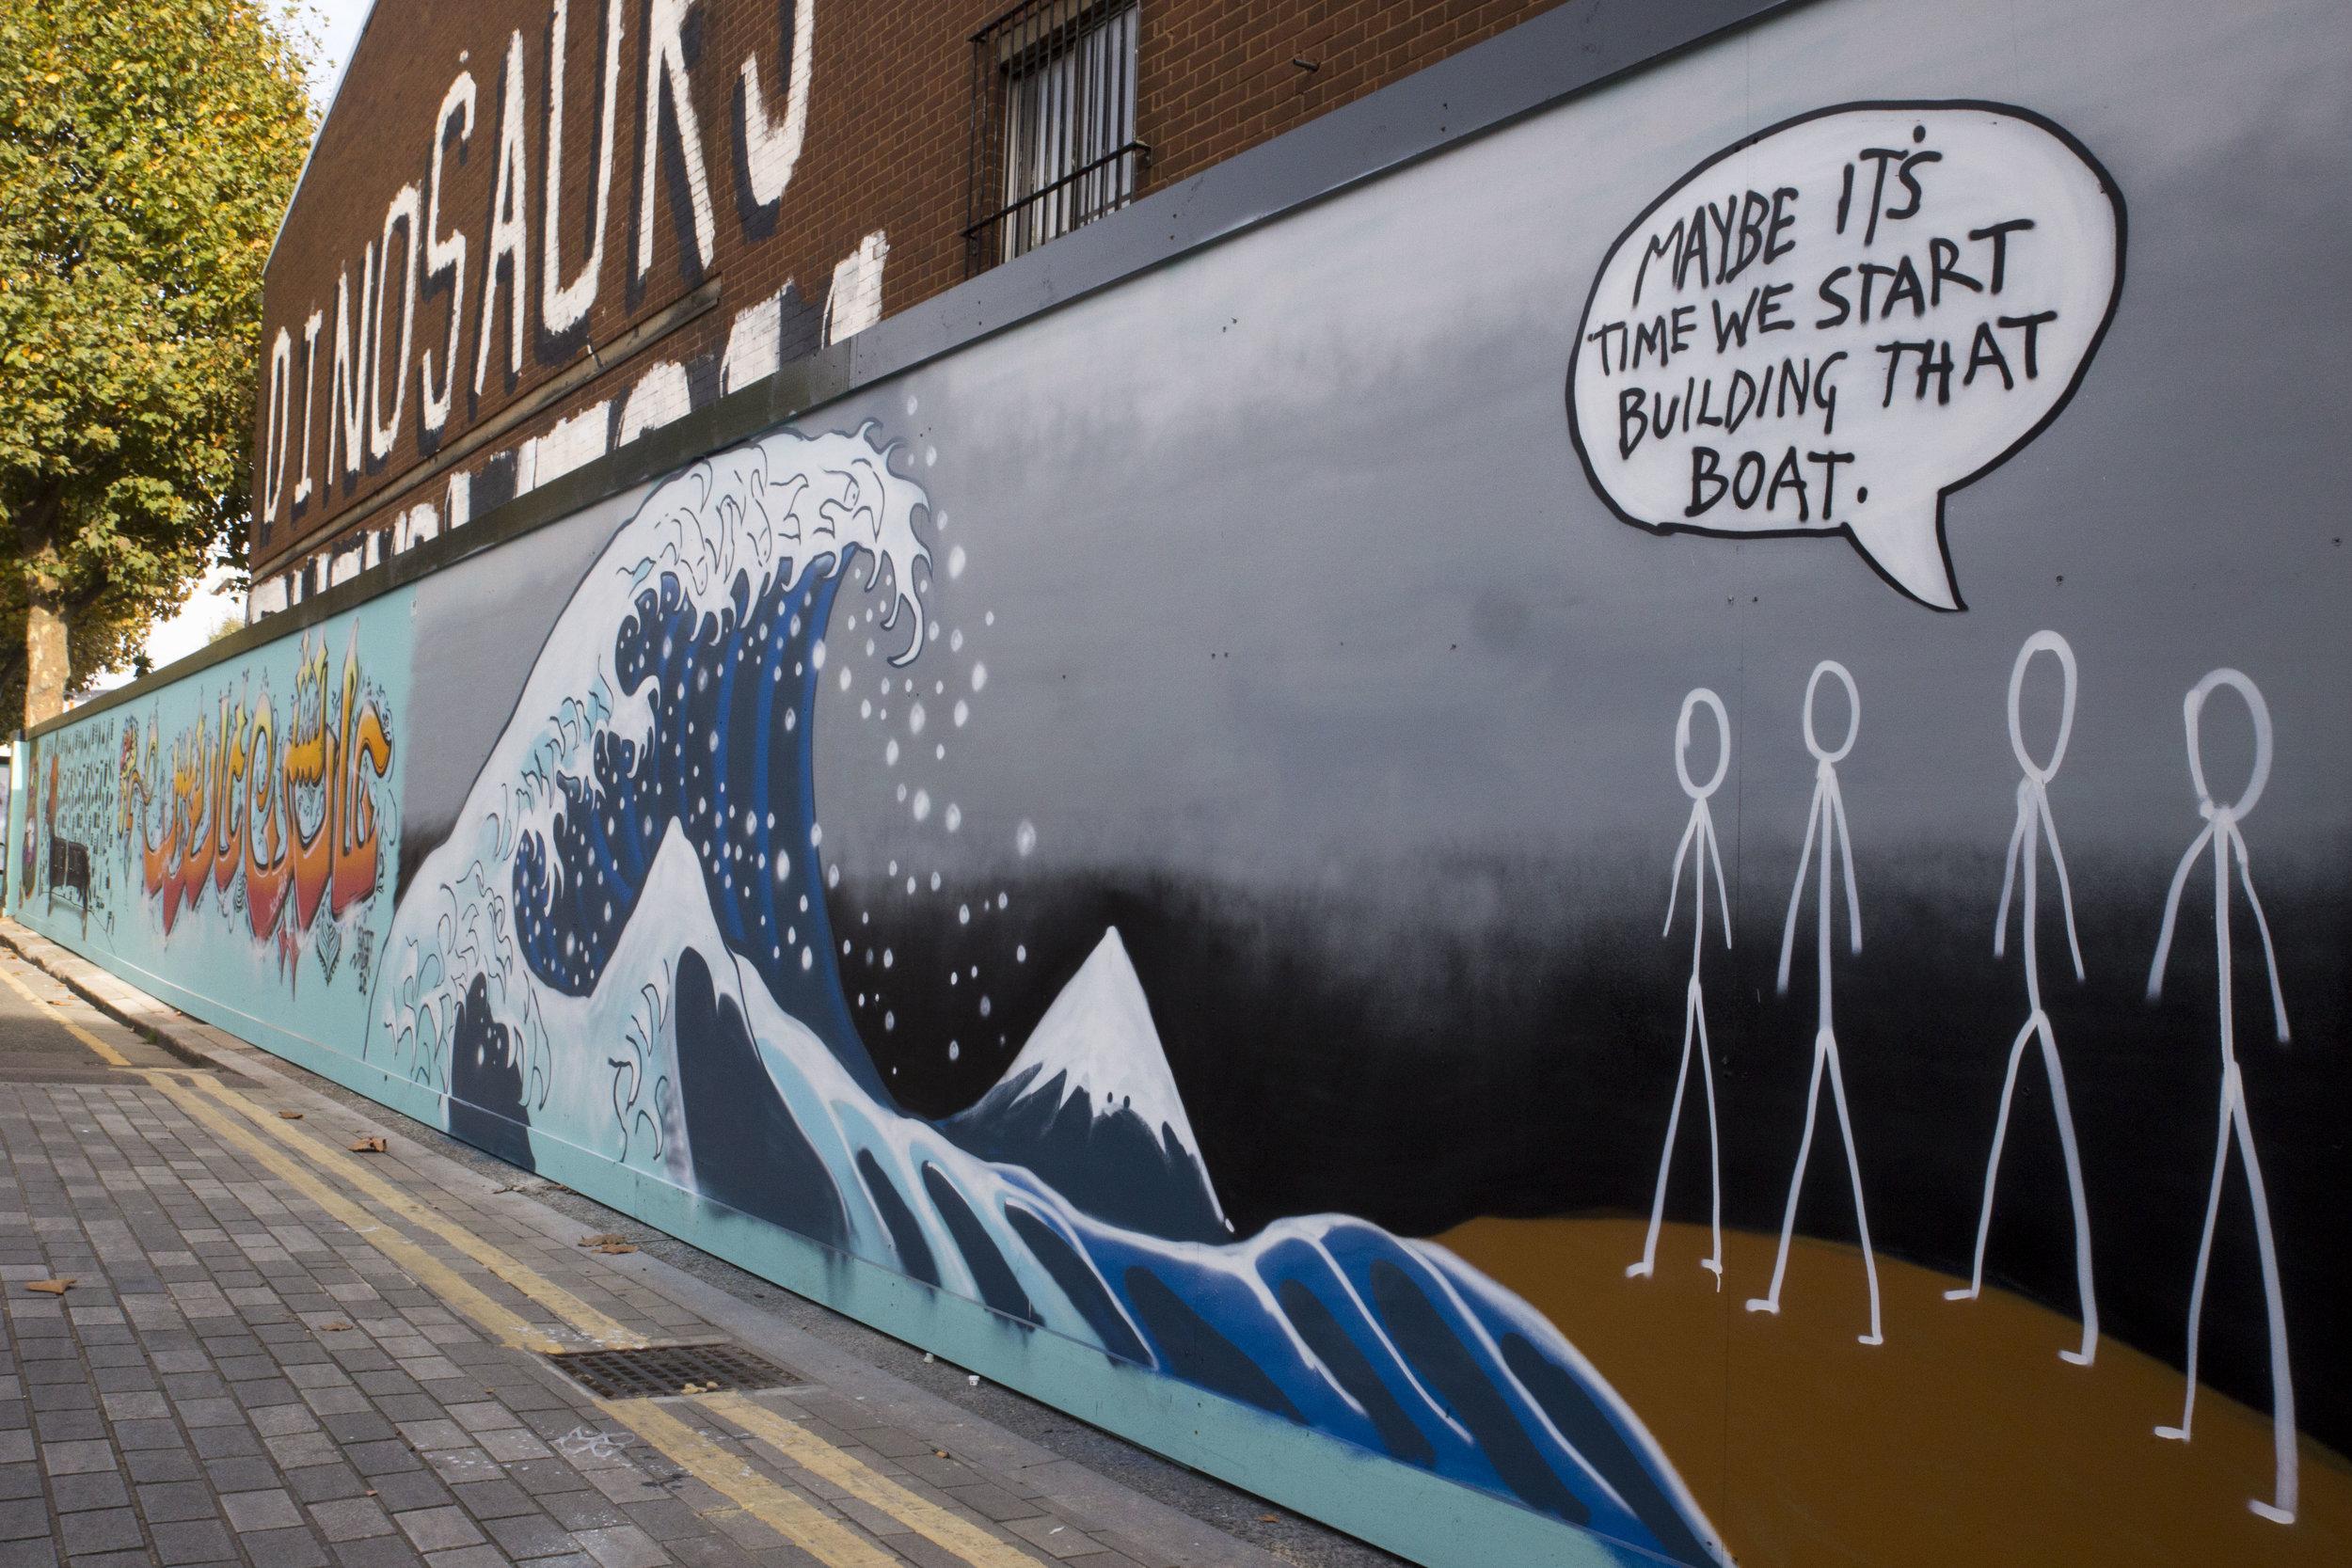 21. Final Hoarding Bream Street Edwin Wharf Pic Credit Kai Raisbeck.jpg